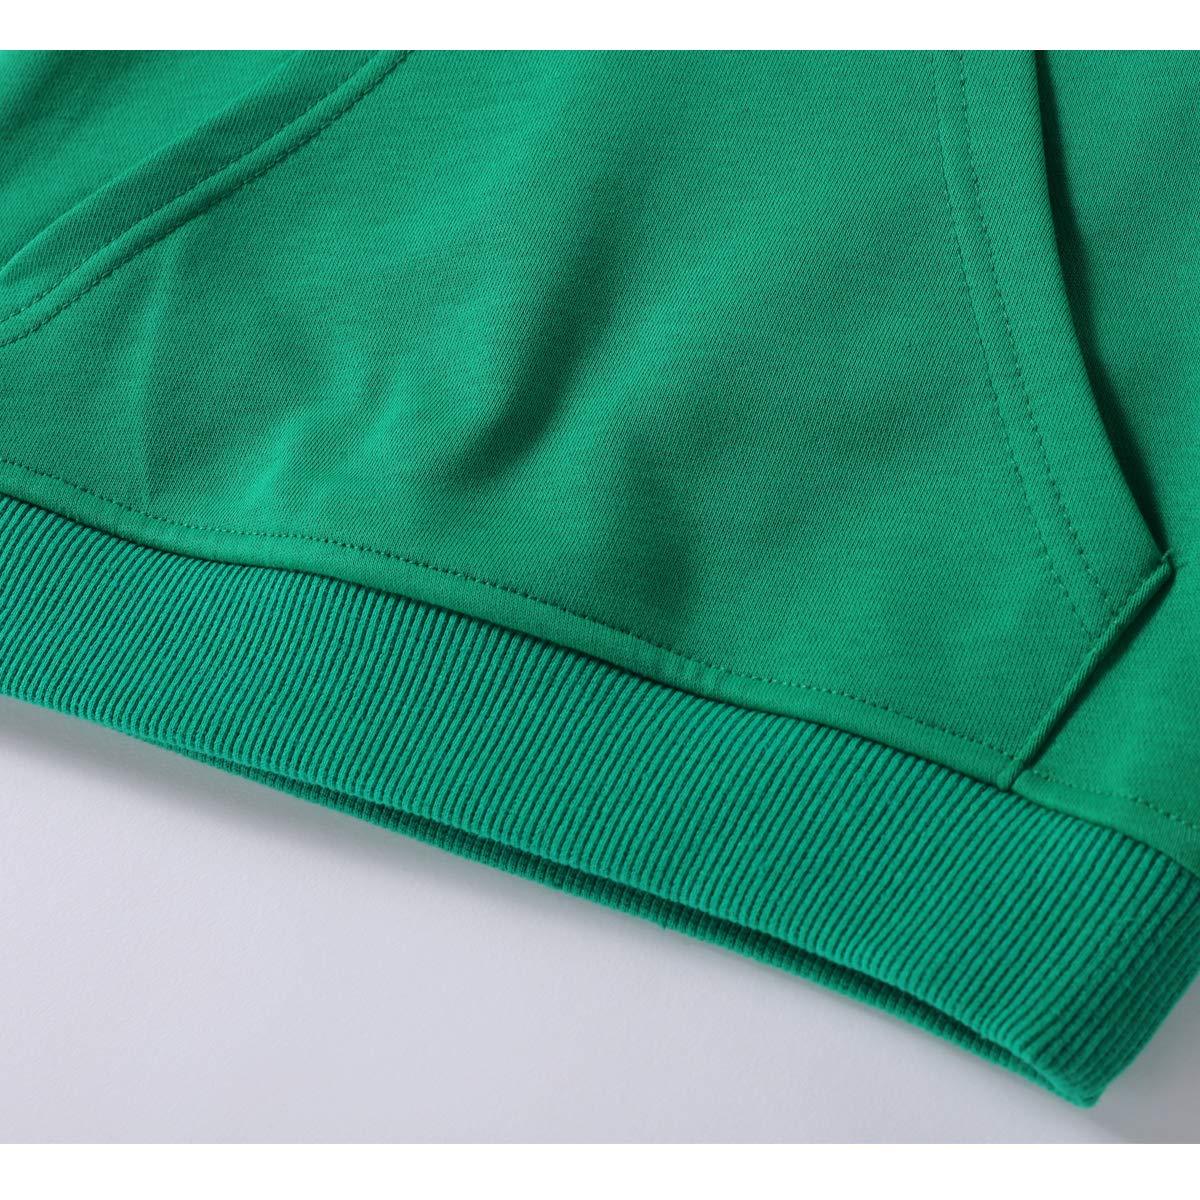 ALALIMINI Boys Hoodies Toddler Kids Pullover Sweatshirts Solid Fleece Cotton Lightweight 2-5T